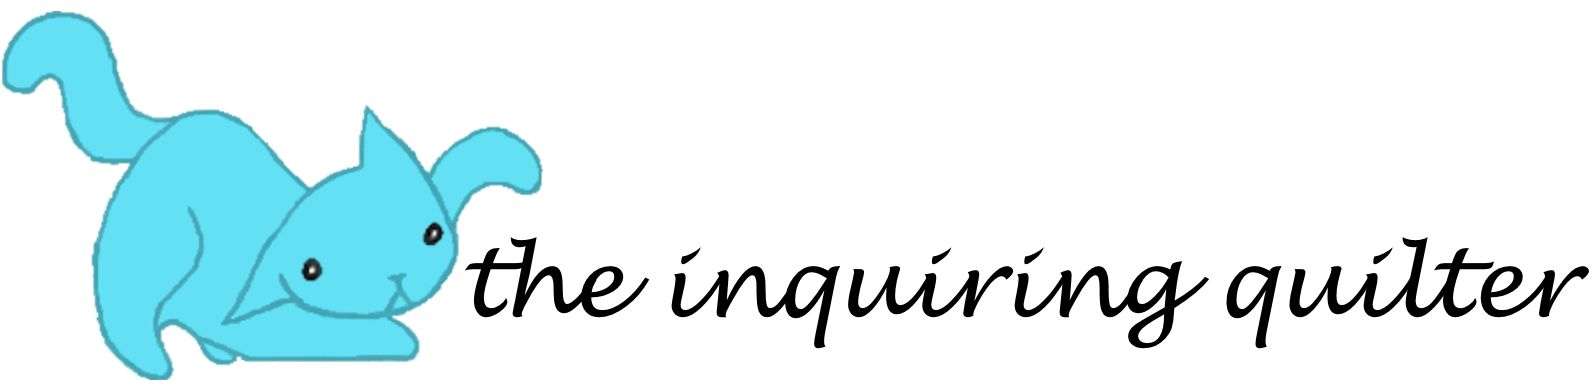 Logo 2016 version 2.jpg